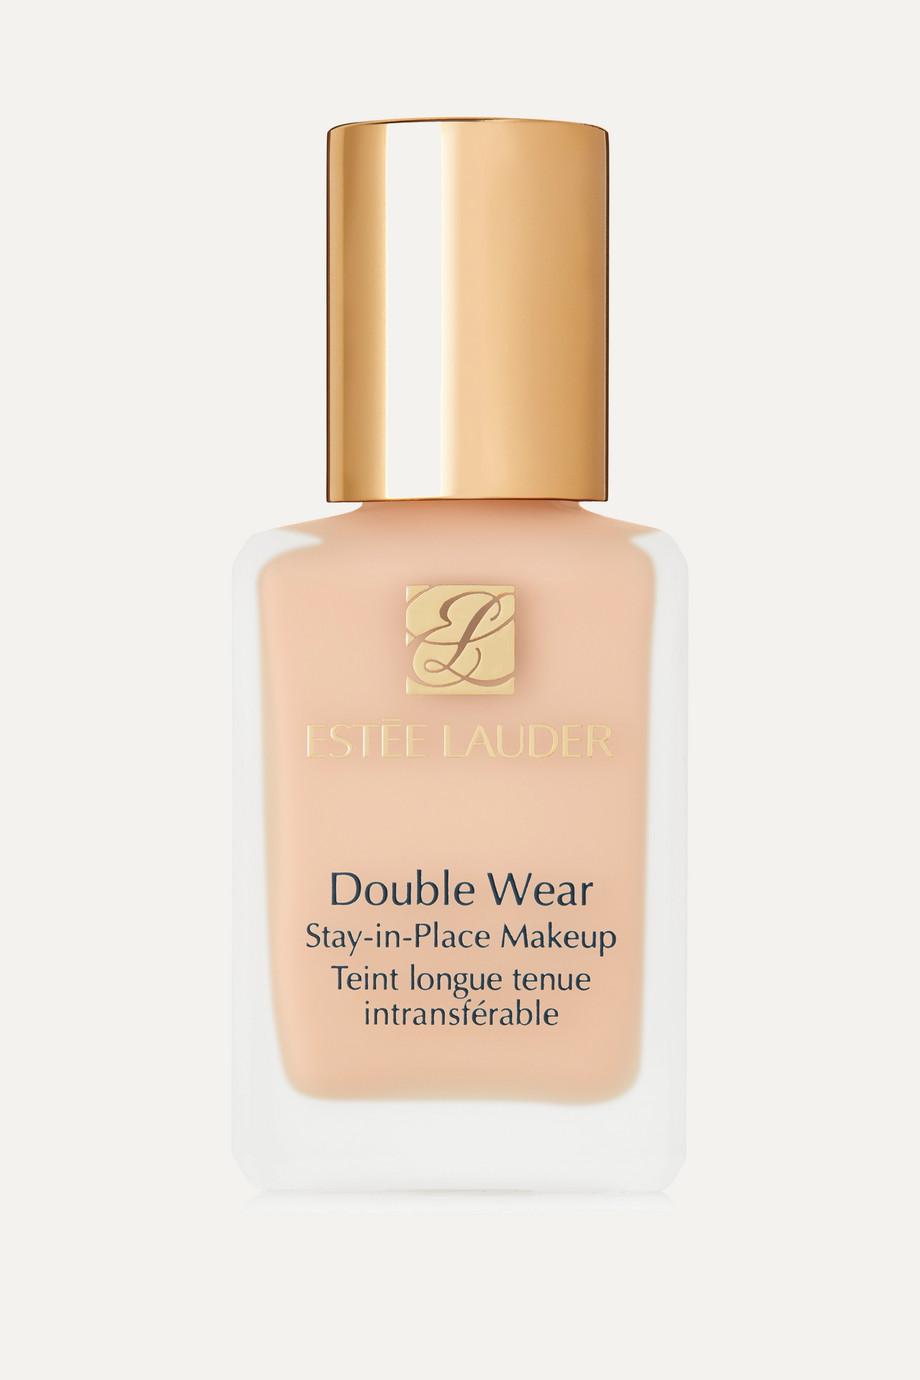 Estée Lauder Double Wear Stay-in-Place Makeup – Alabaster 0N1 – Foundation